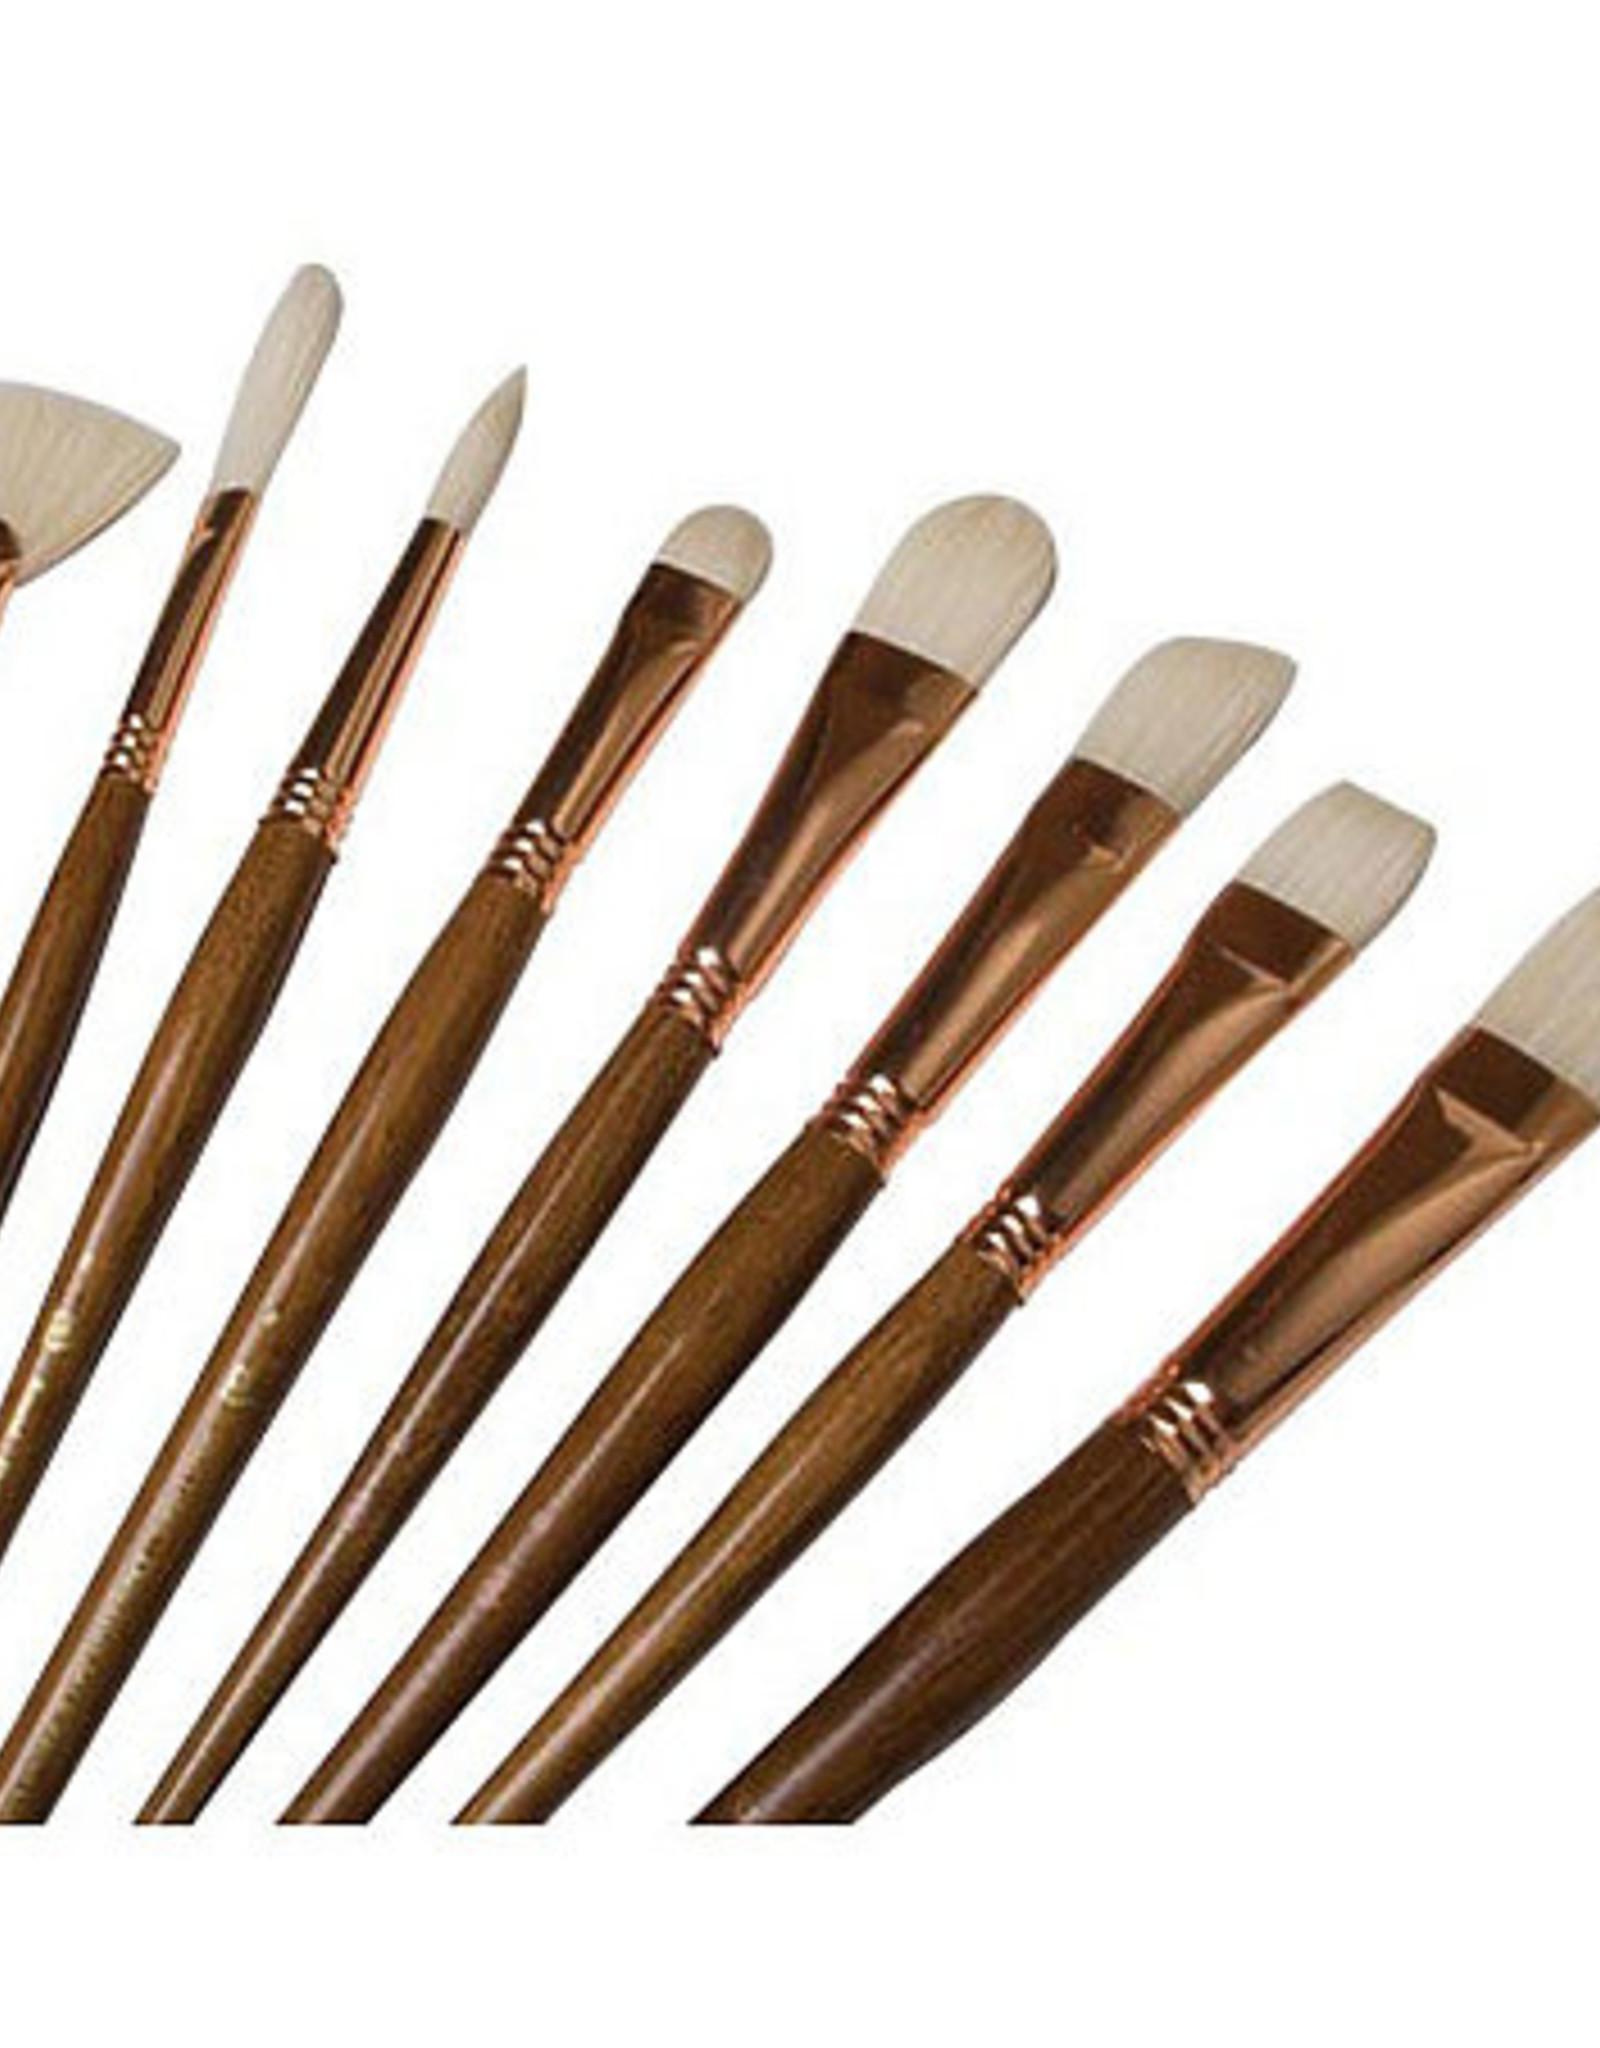 Princeton Art & Brush Co Refine Natural Bristle Brush Filbert